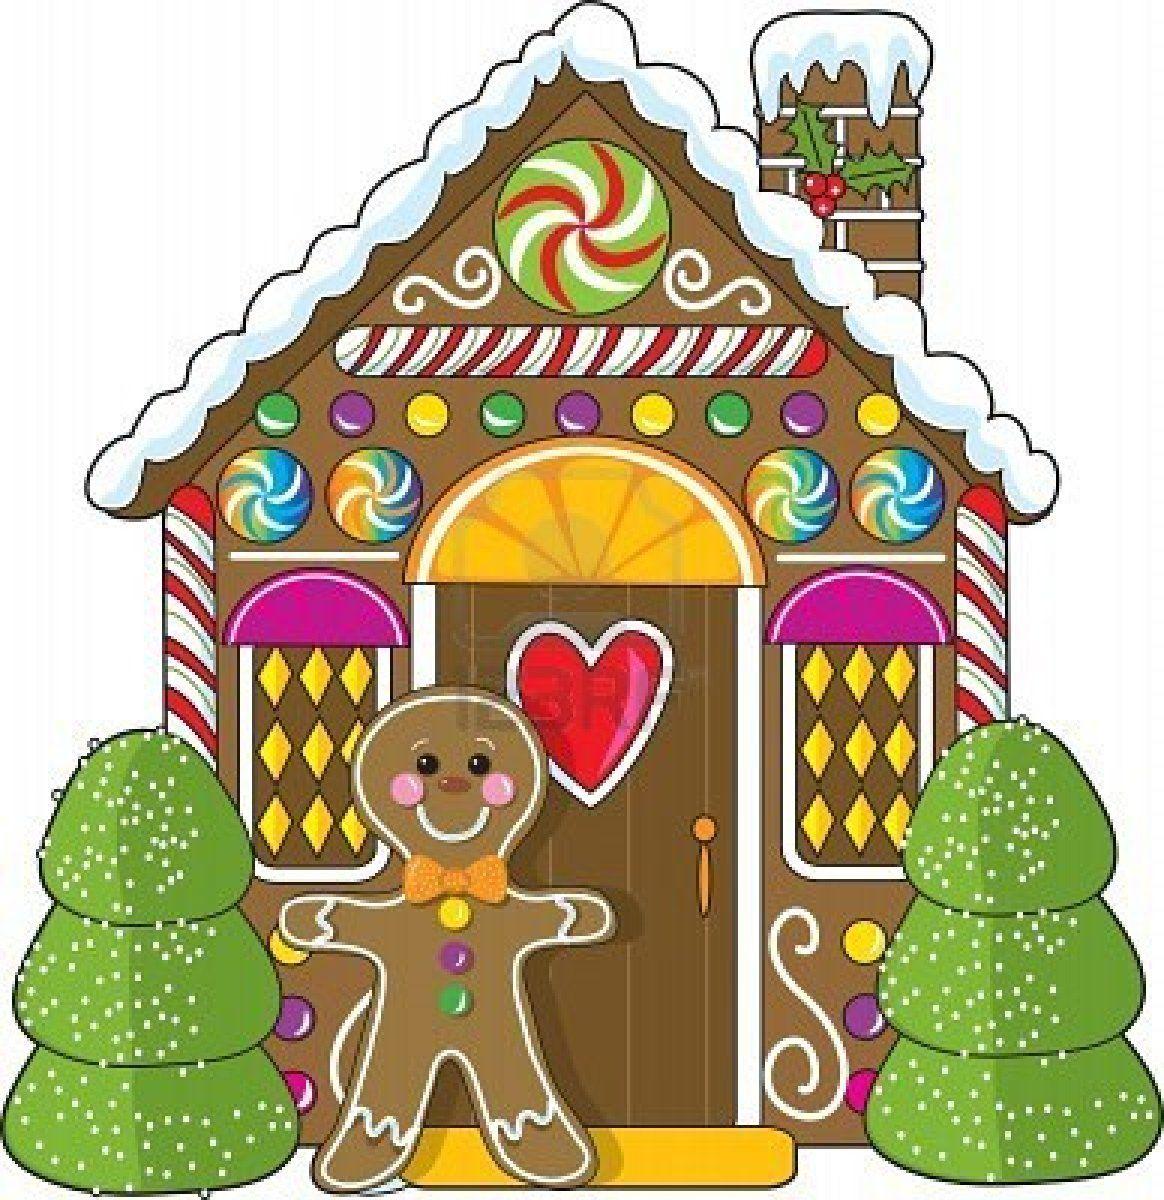 Gingerbread House Gingerbread House Kids Gingerbread House Christmas Art